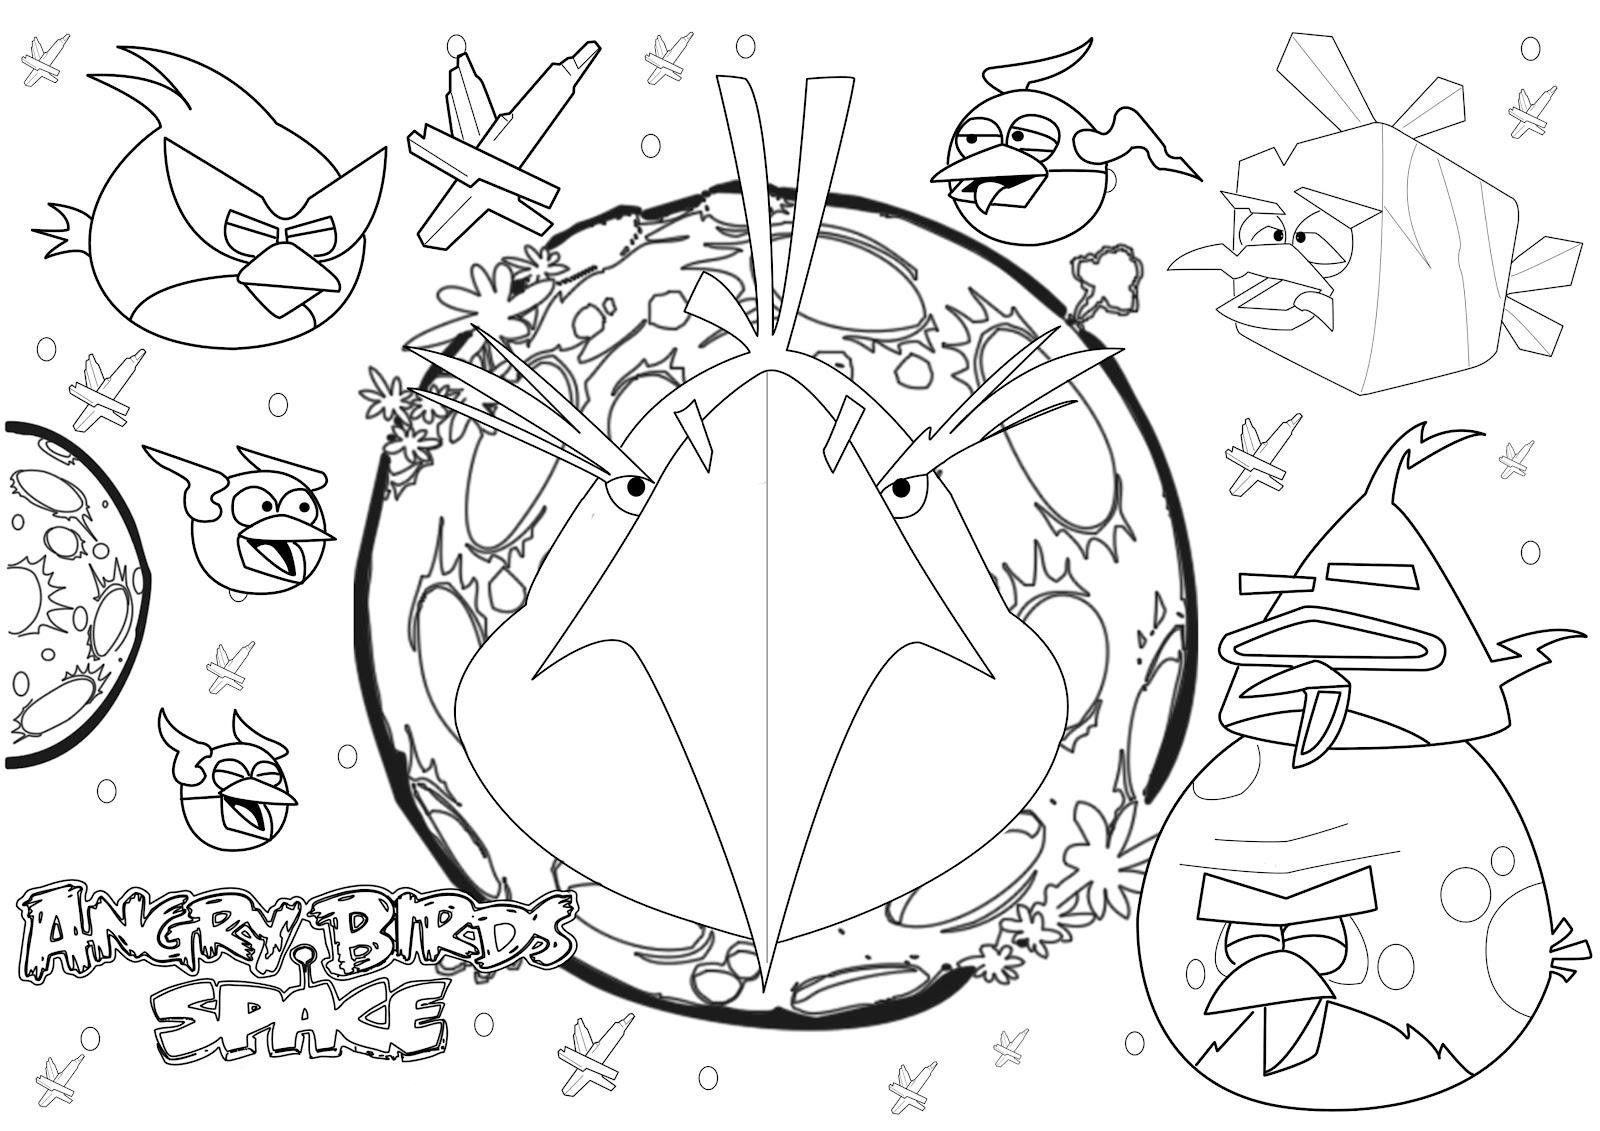 Coloriage Dessins Angry Birds 6 Dibujos Faciles Para Dibujar Dibujos Para Colorear Paginas Para Colorear